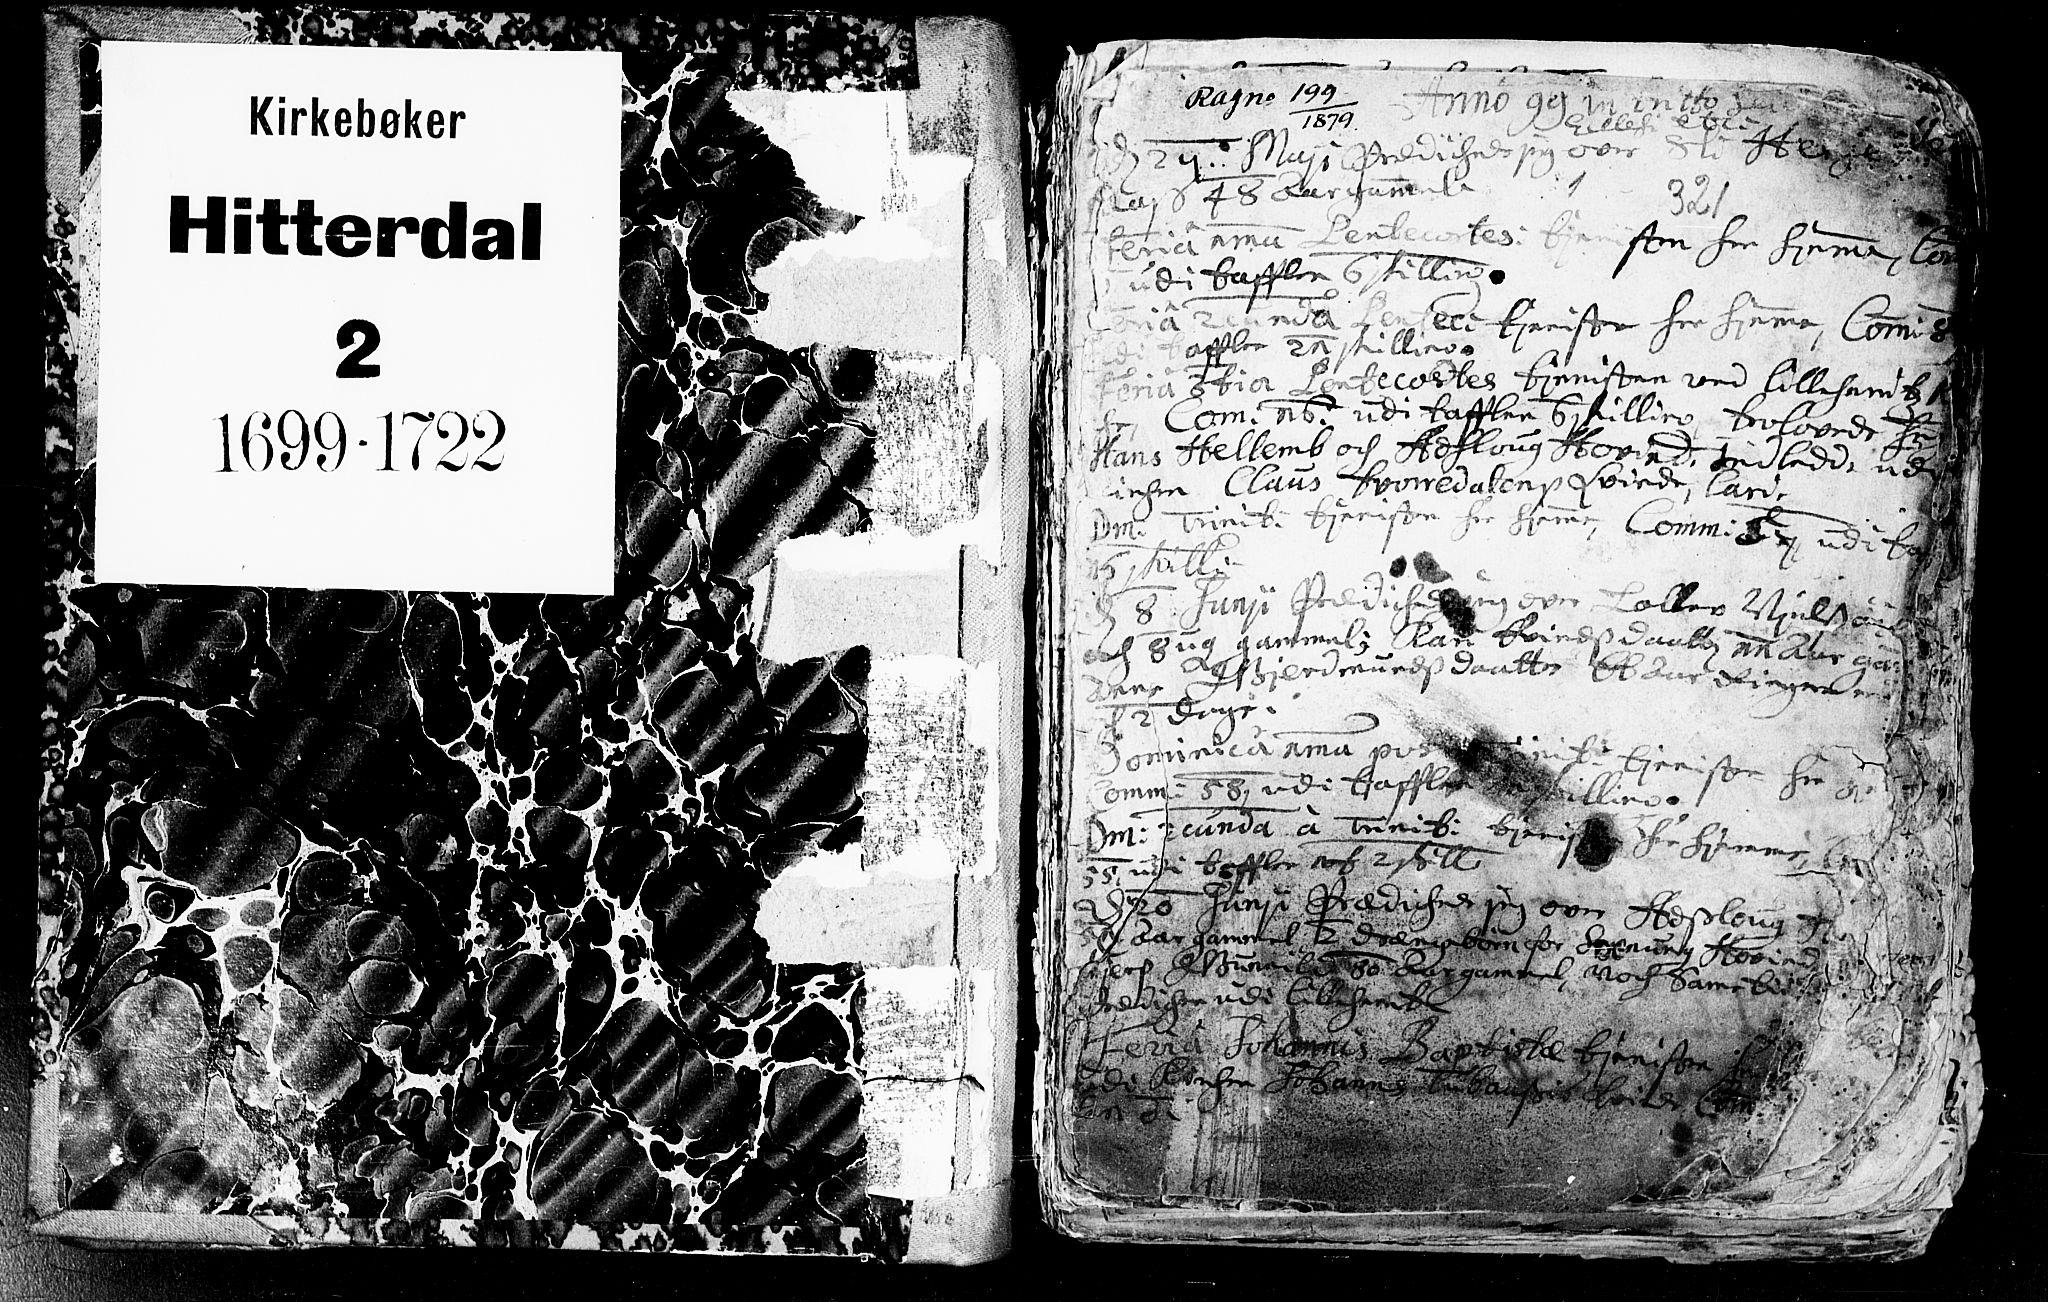 SAKO, Heddal kirkebøker, F/Fa/L0002: Ministerialbok nr. I 2, 1699-1722